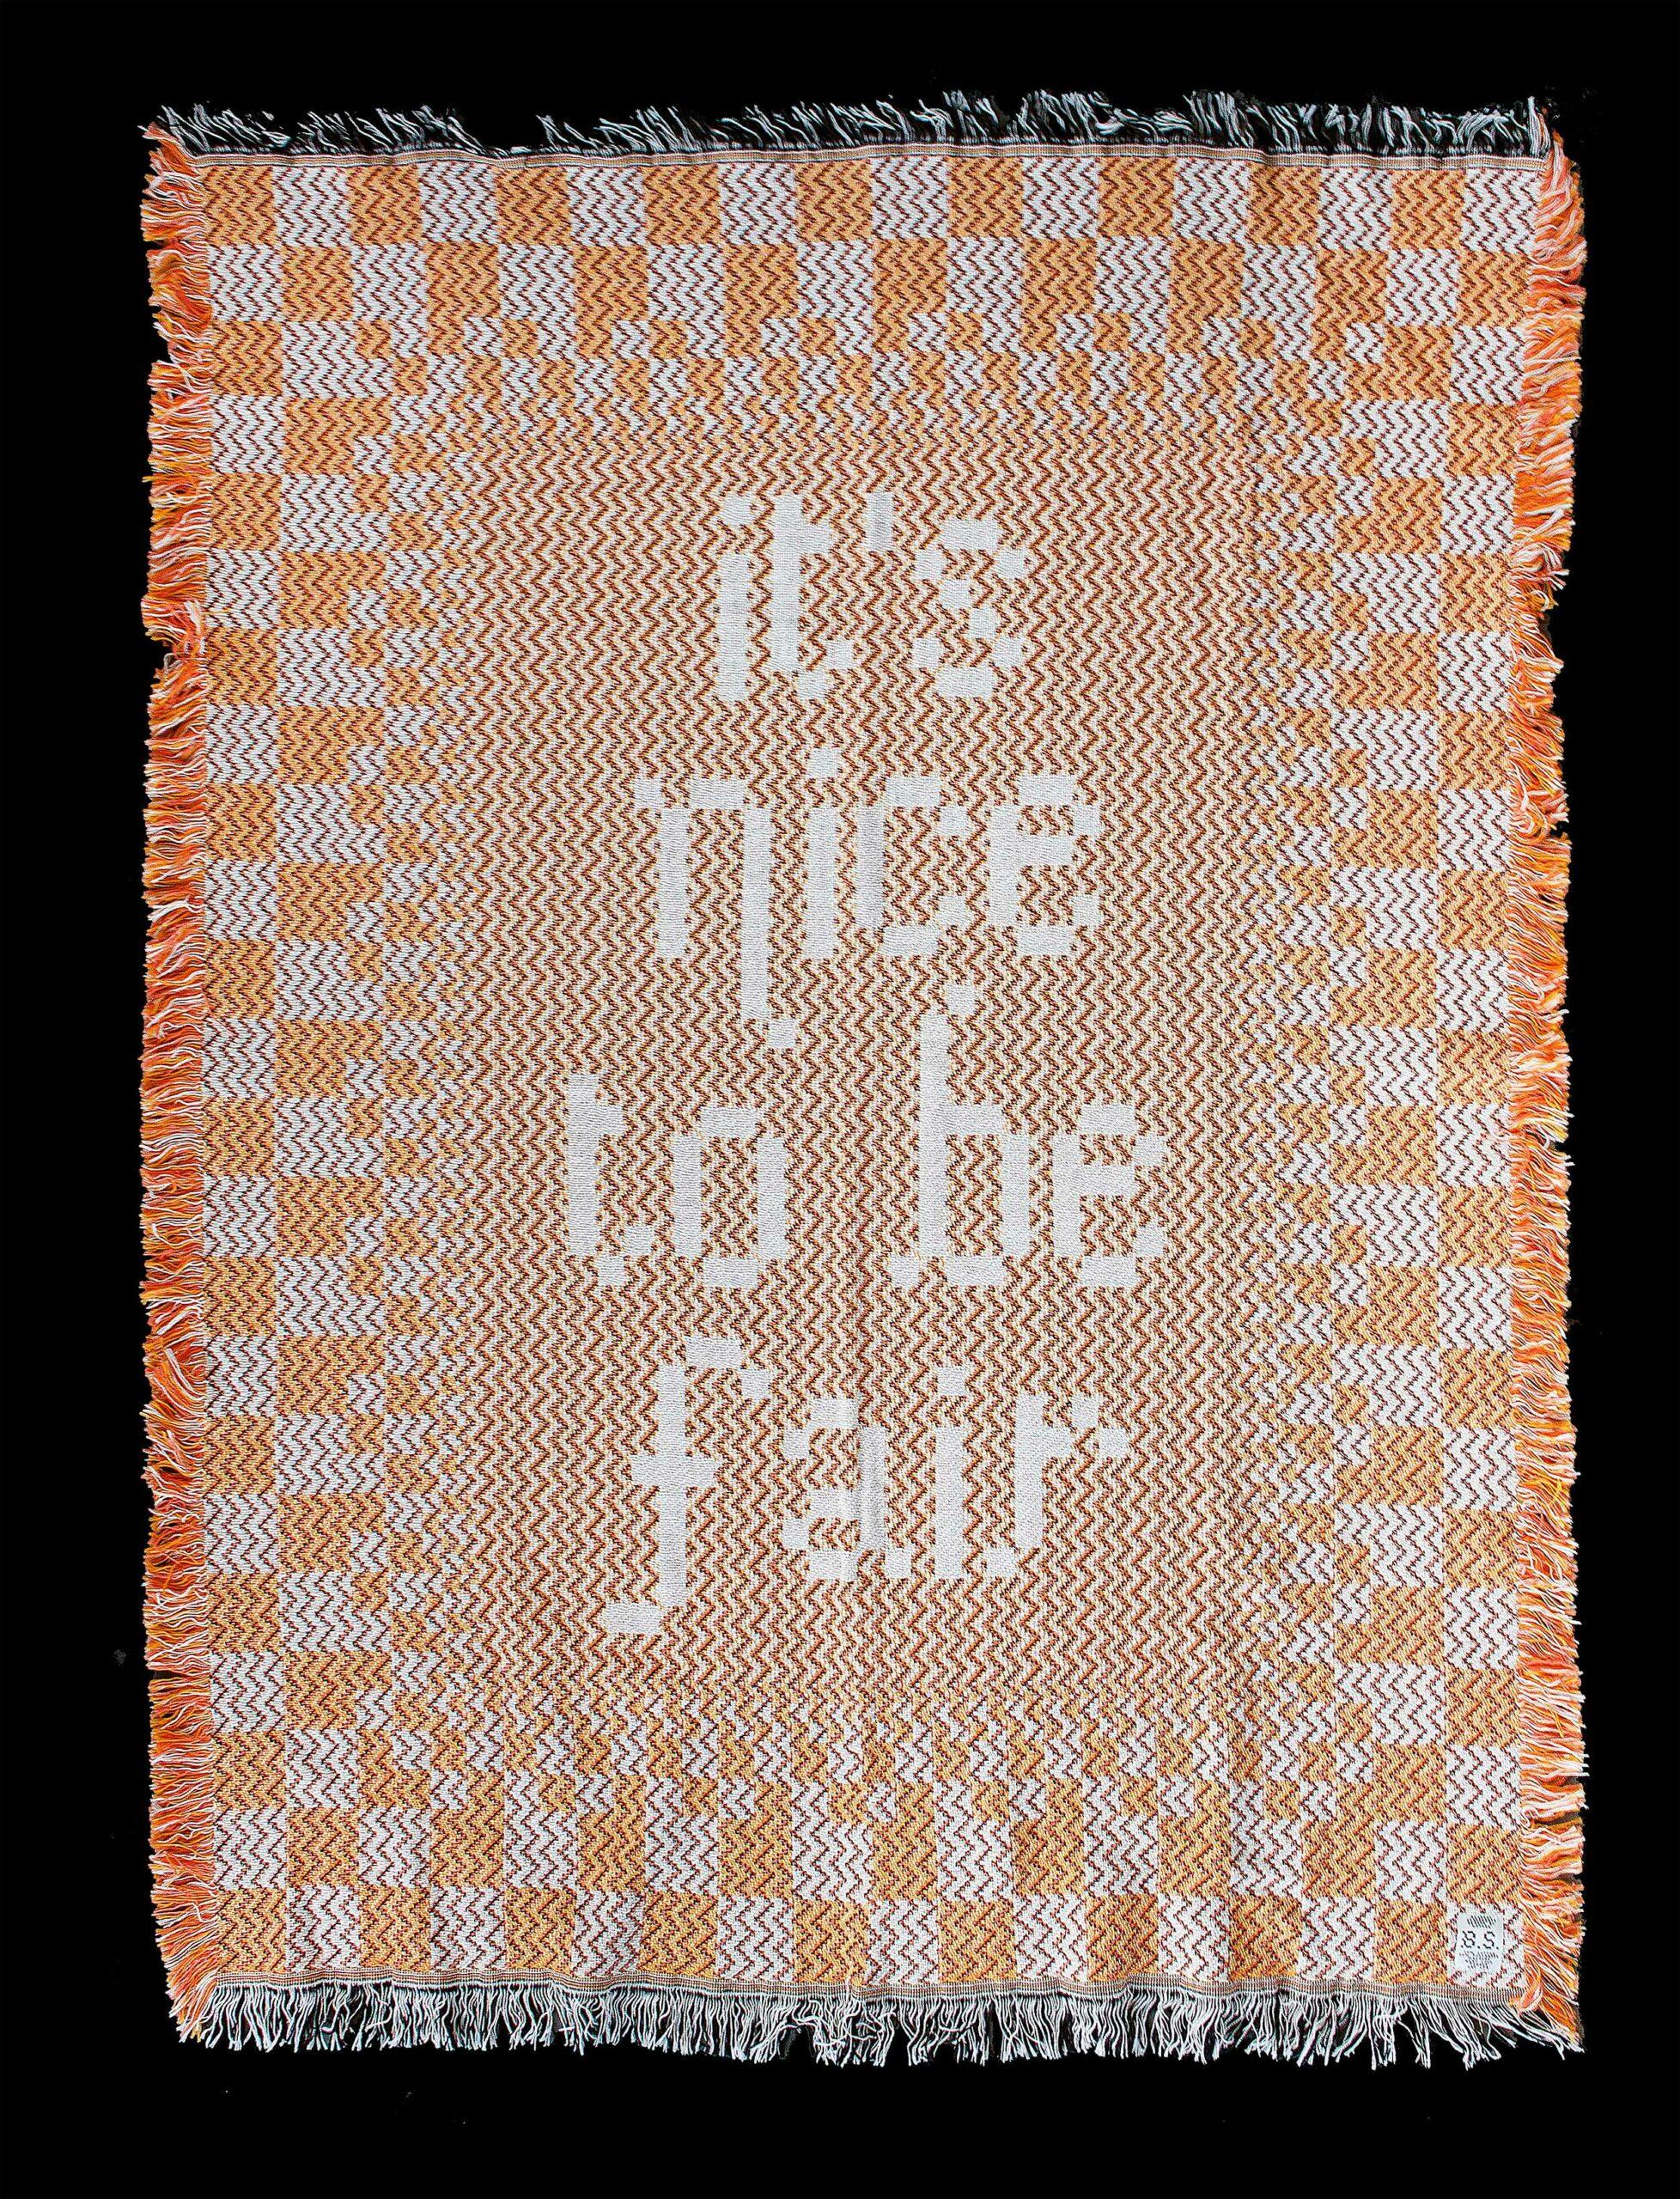 Matthijs van Leeuwen, Matt van Leeuwen, Blanket Statement, Mother Design, Samantha Kim, New York, It's nice to be fair